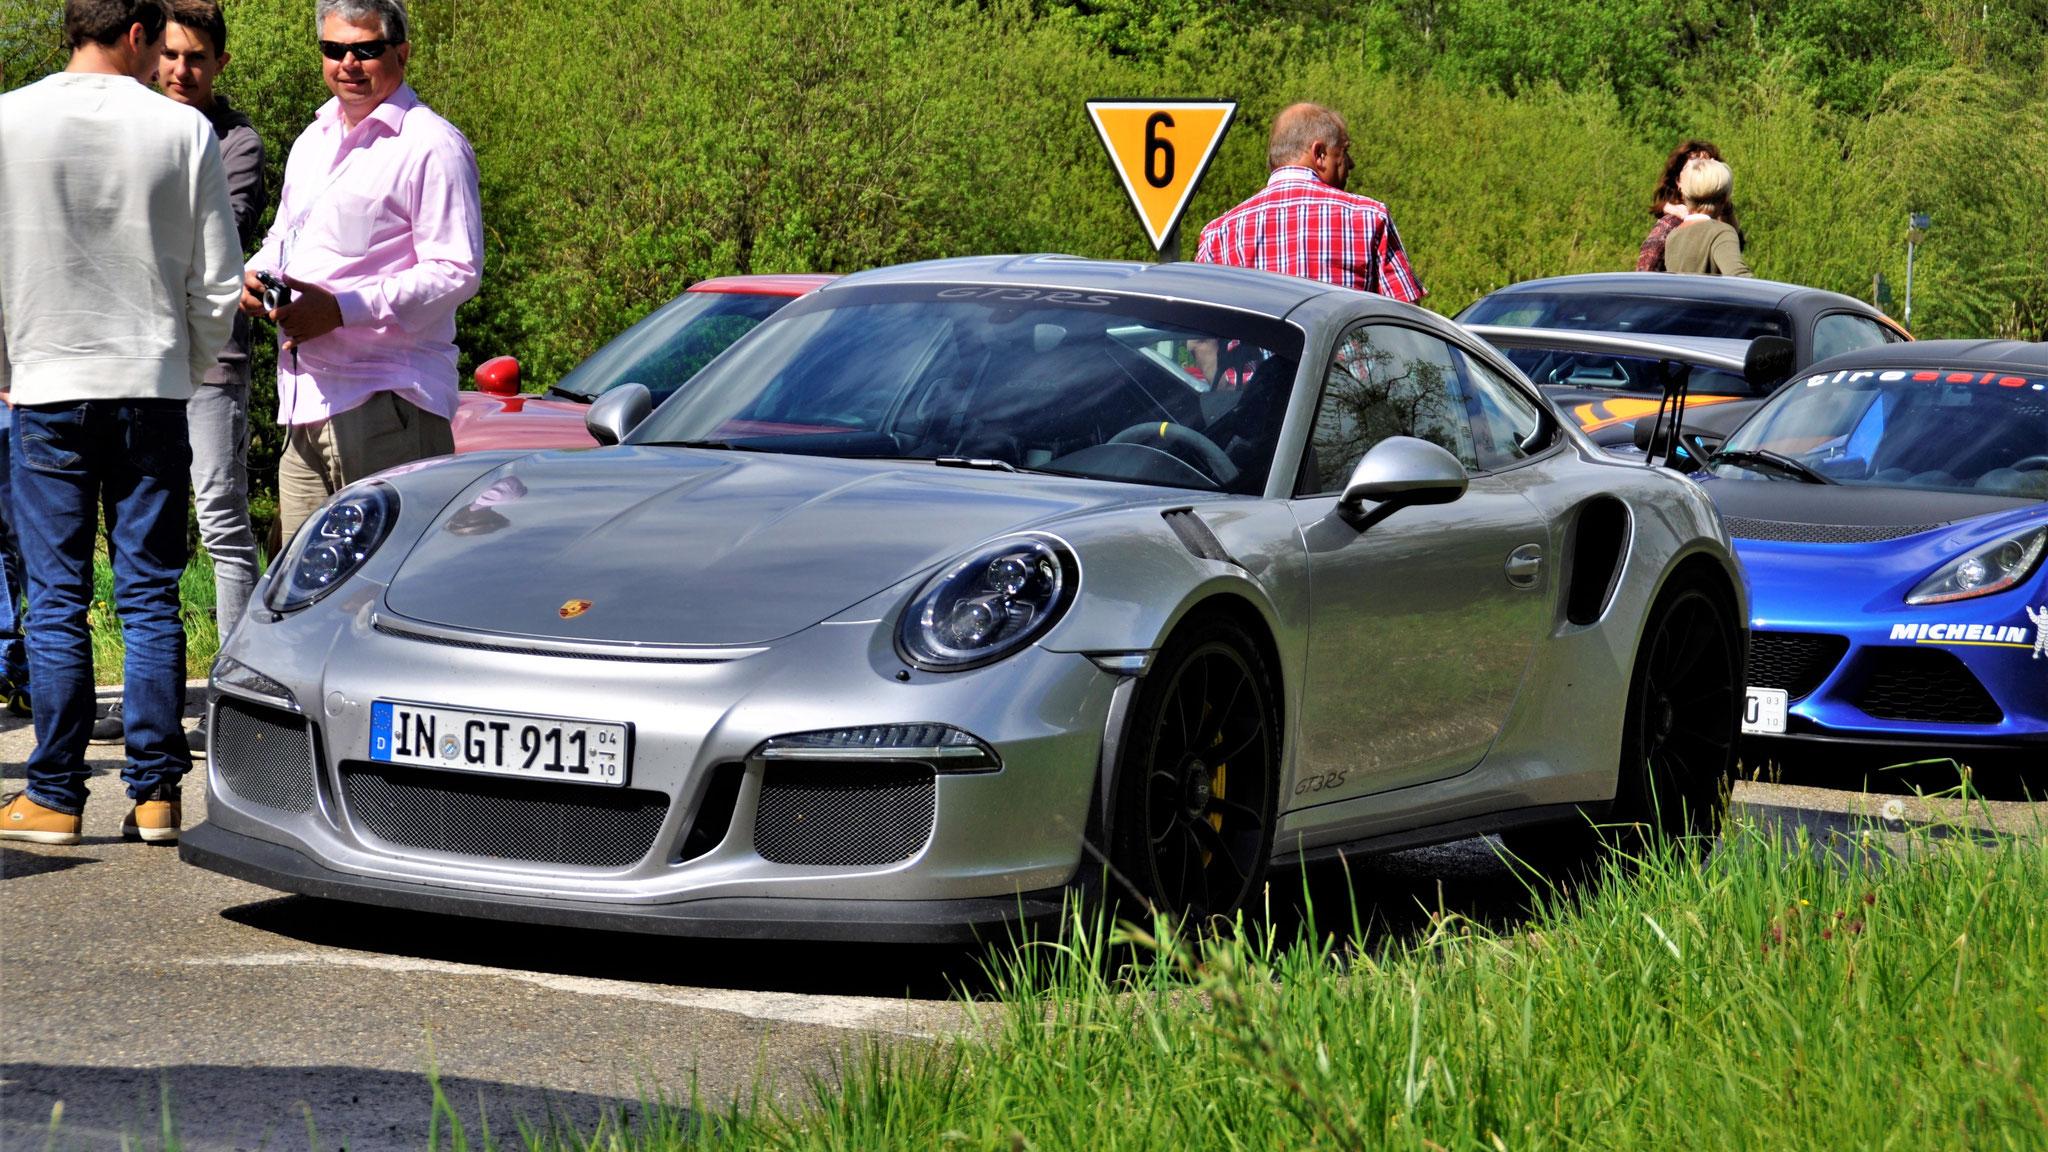 Porsche 911 GT3 RS - IN-GT-911